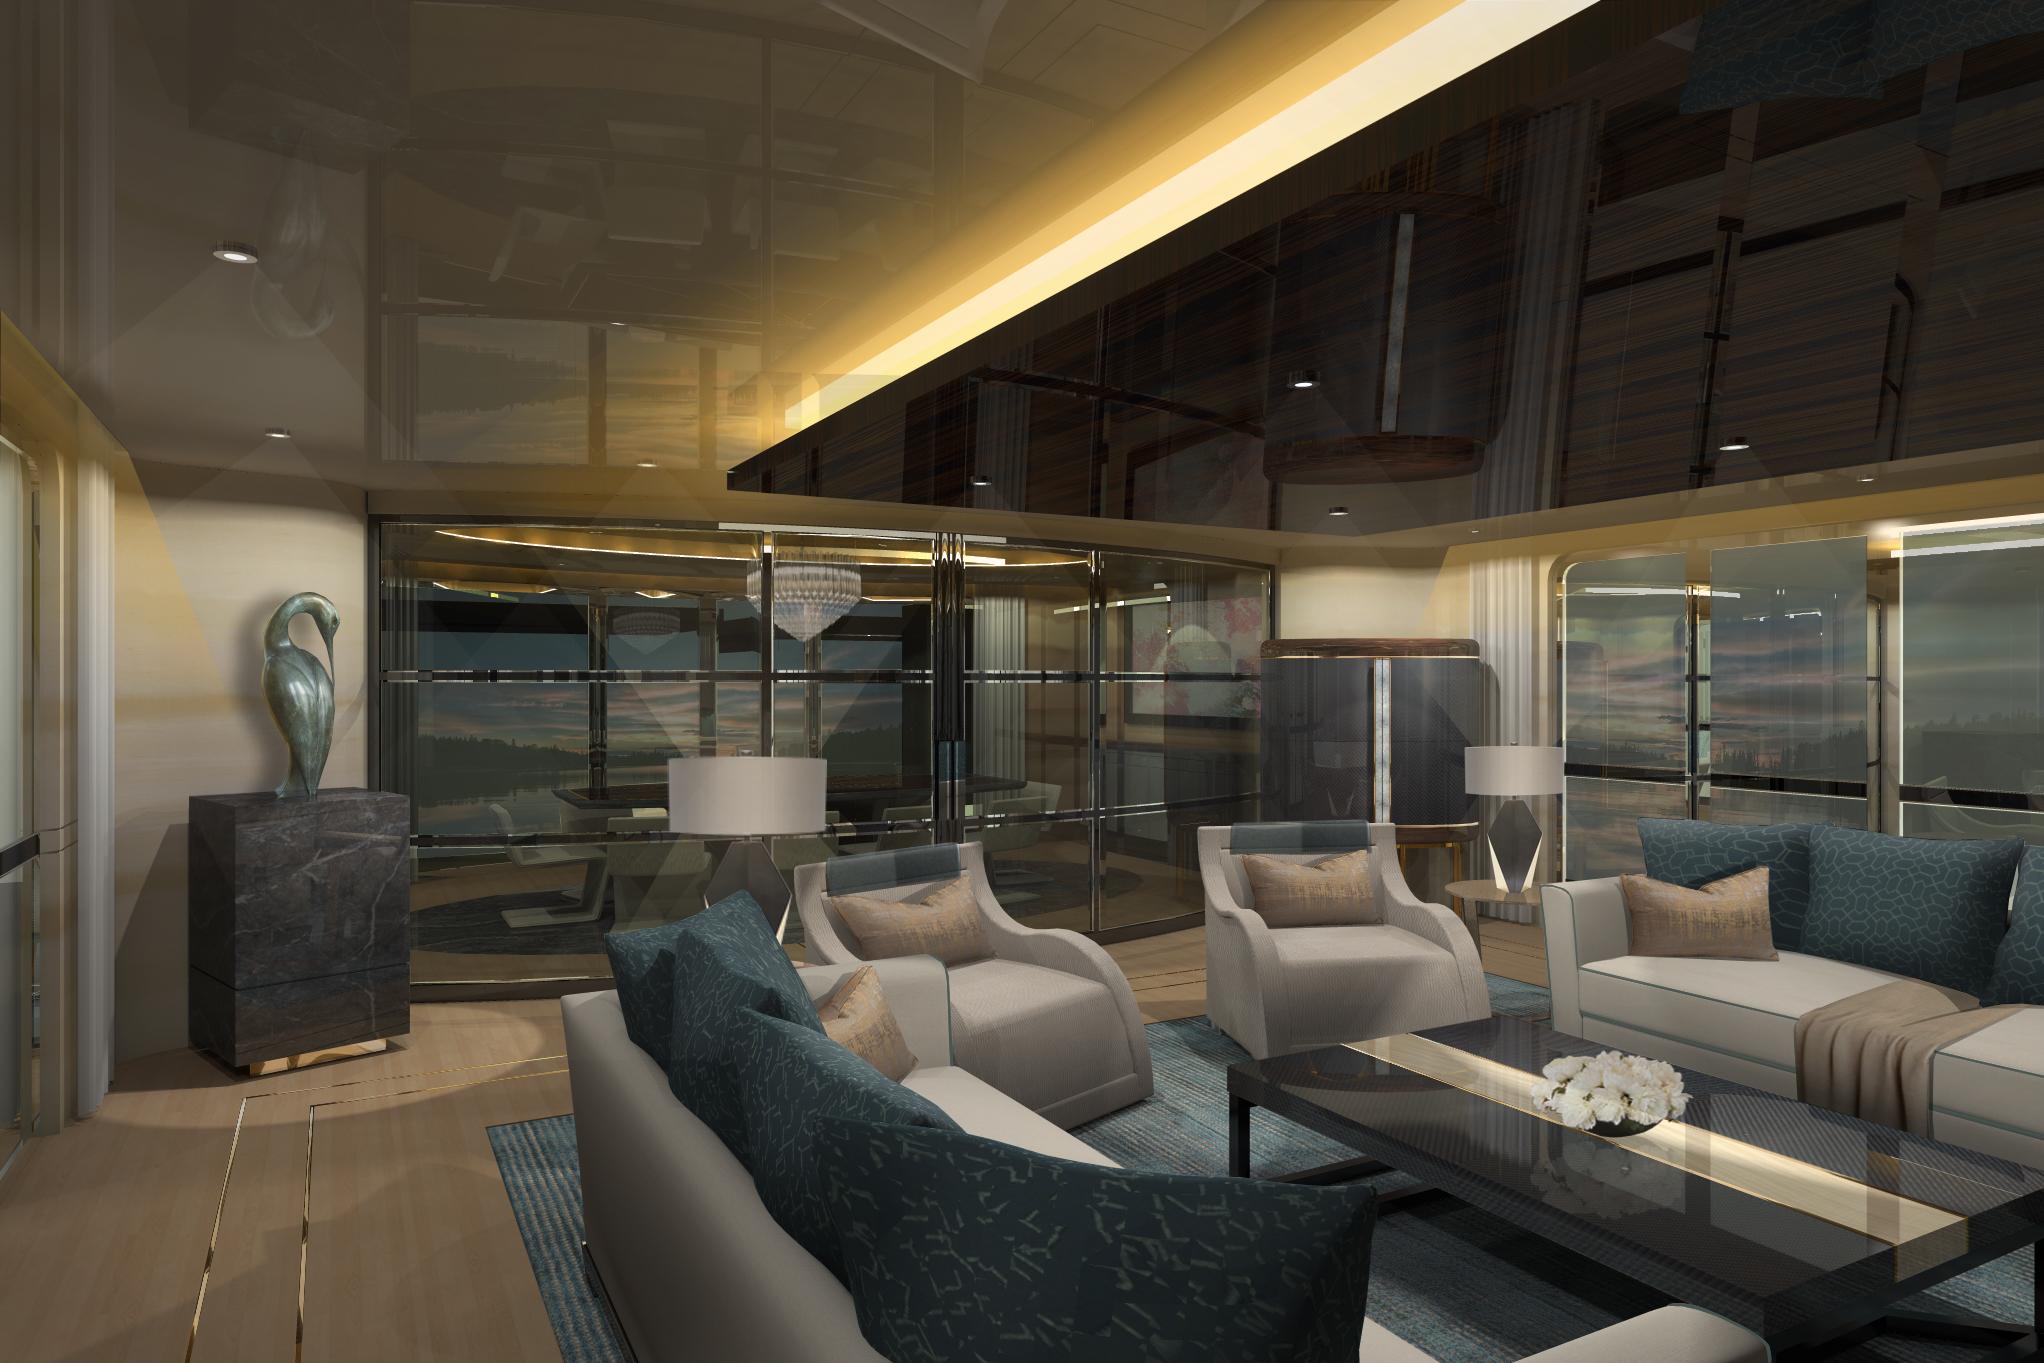 Superyacht Living Room View 2.jpg